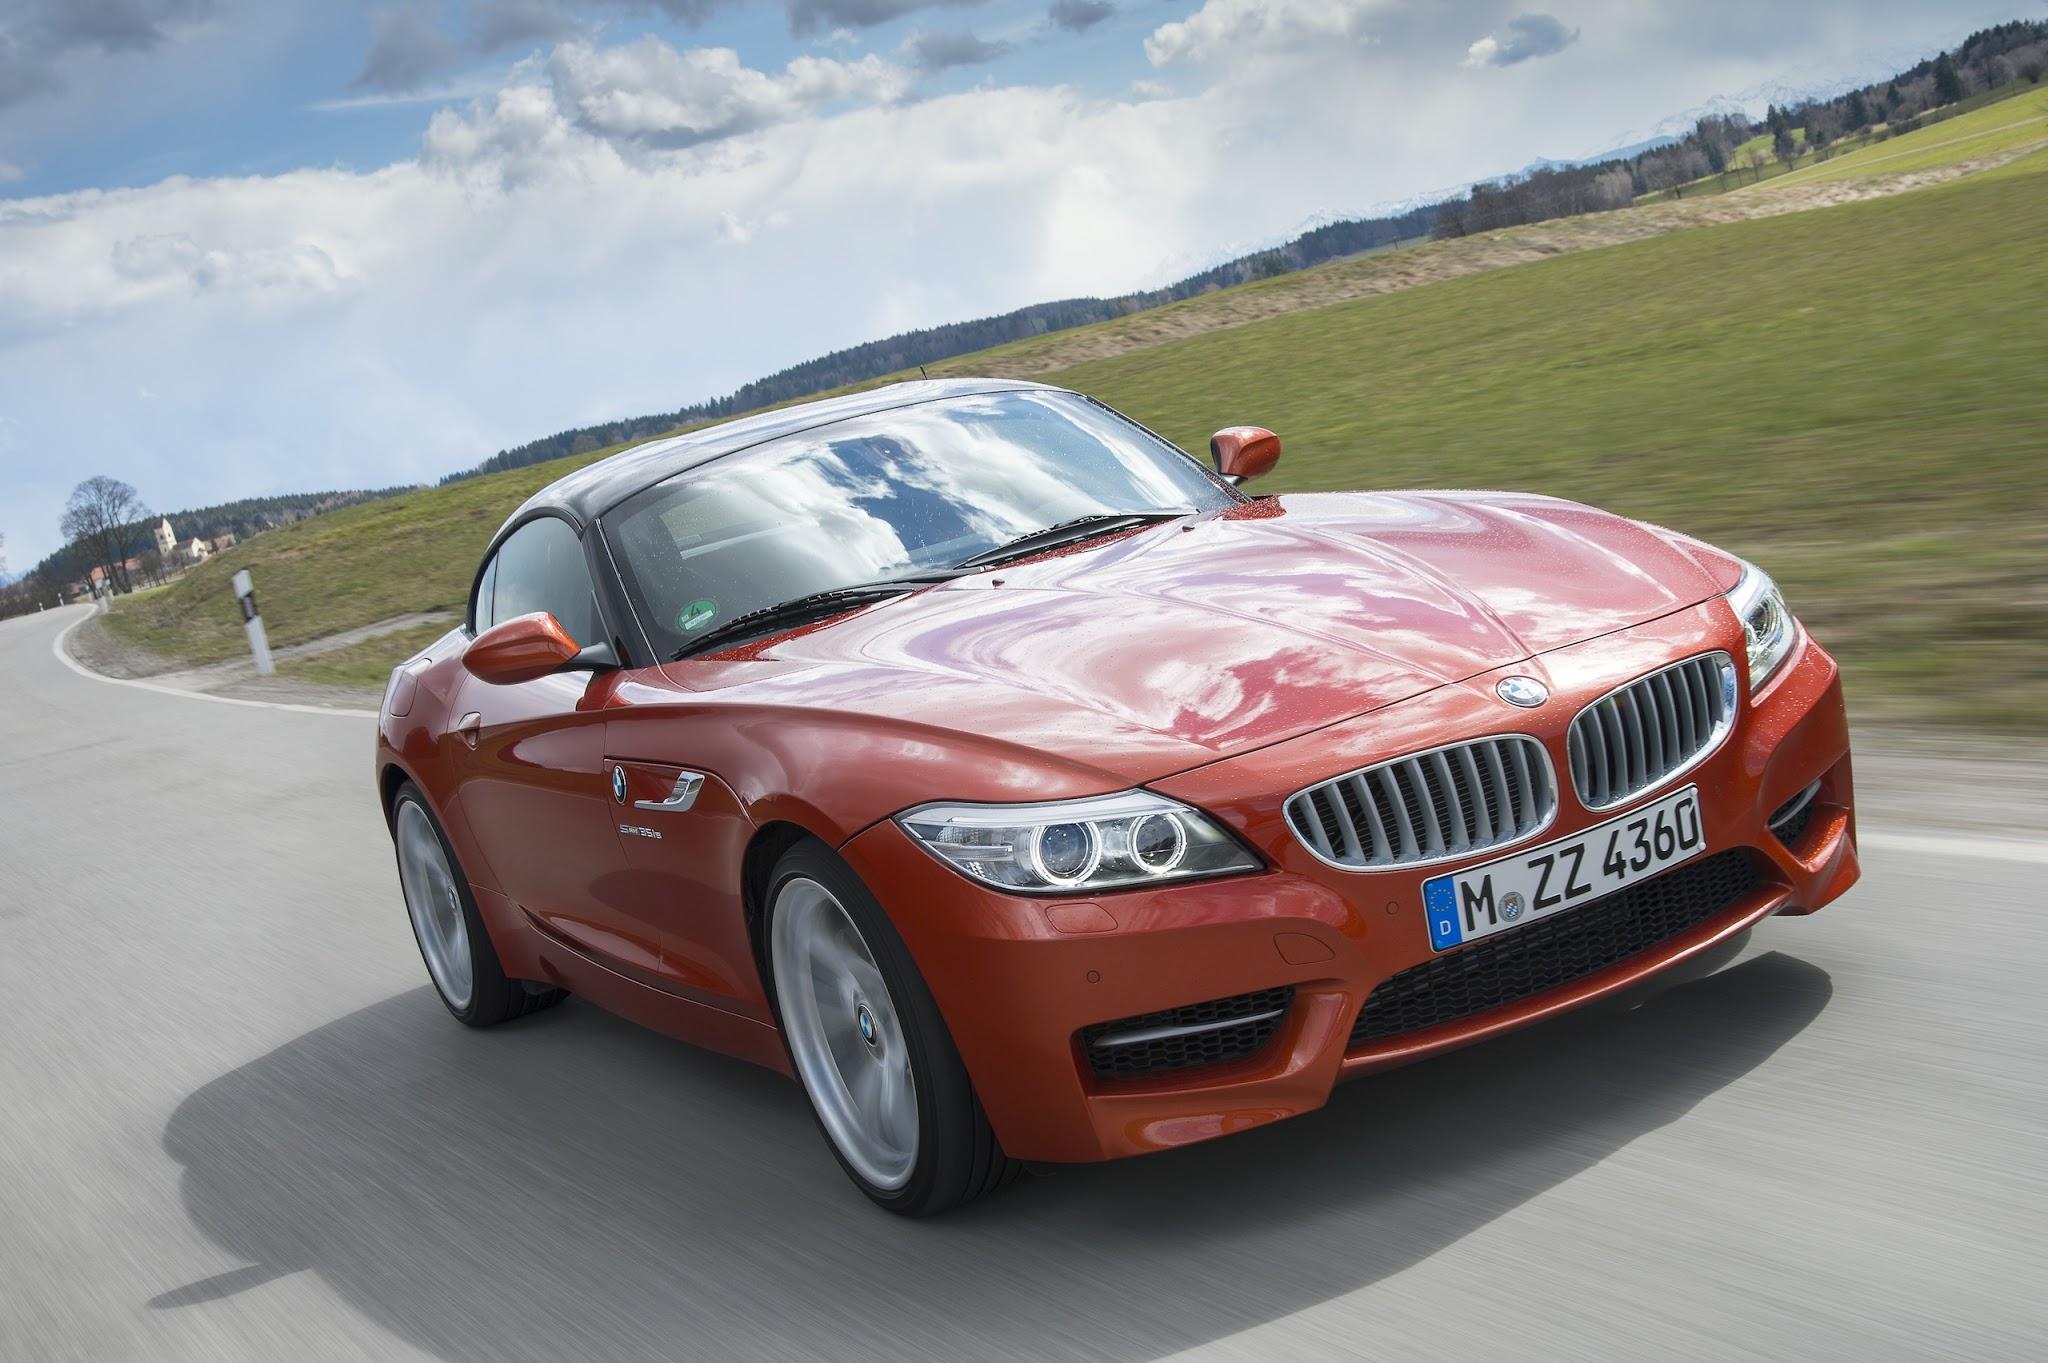 BMW・i8の画像 p1_39